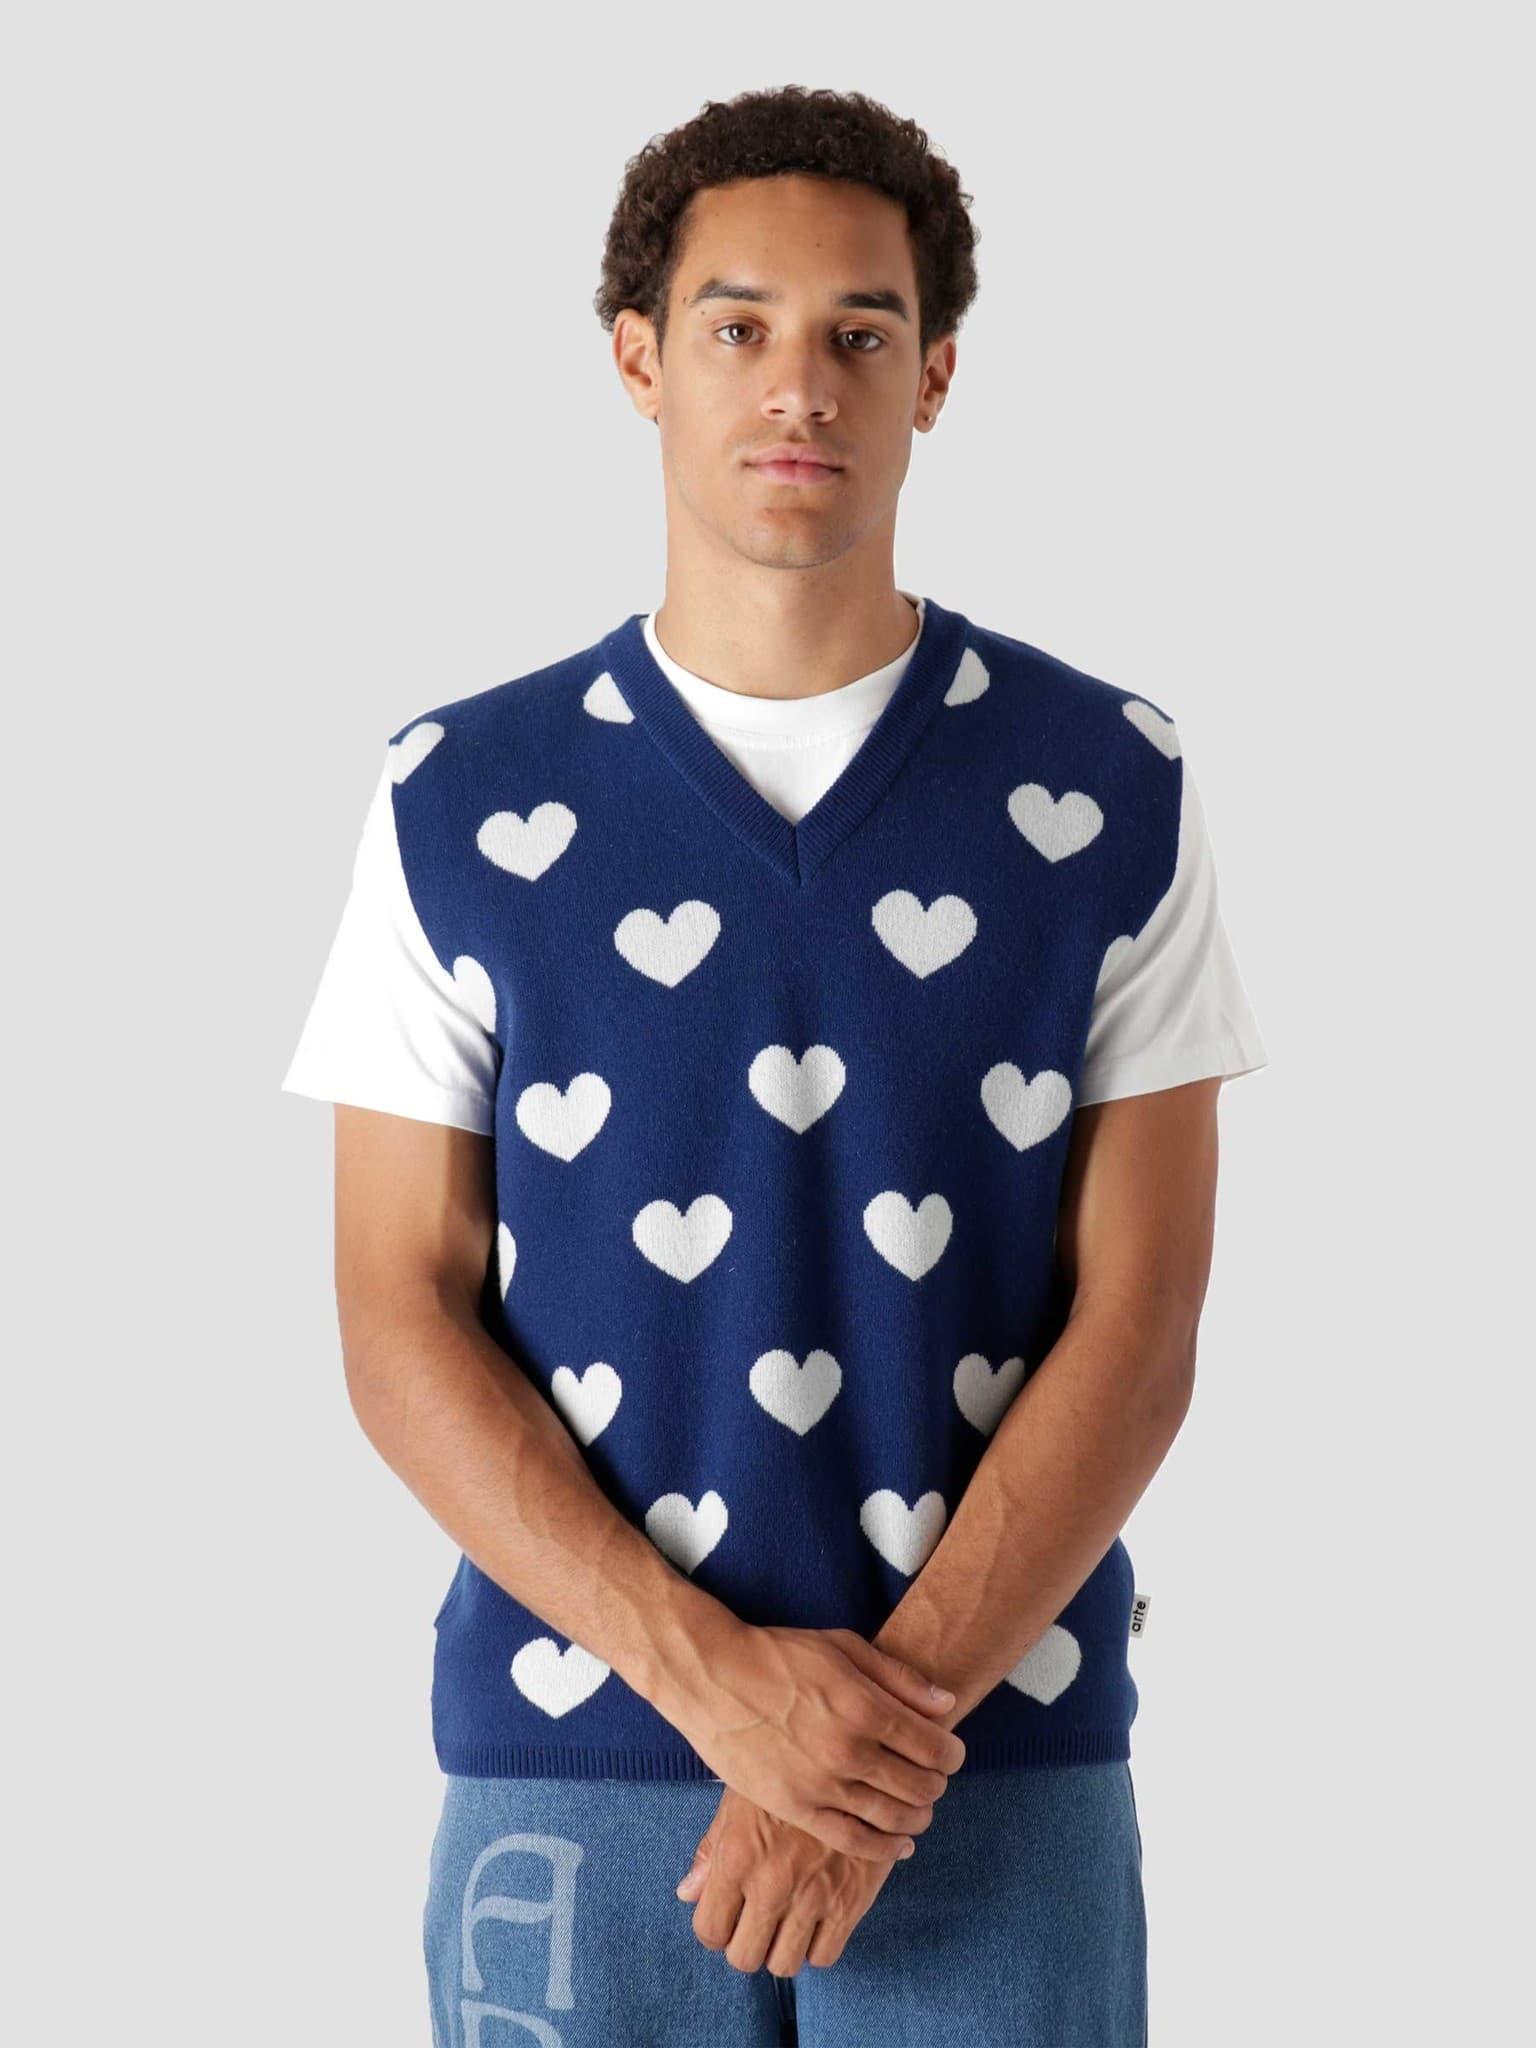 Klimt Heart Knit Blue White AW21-028K